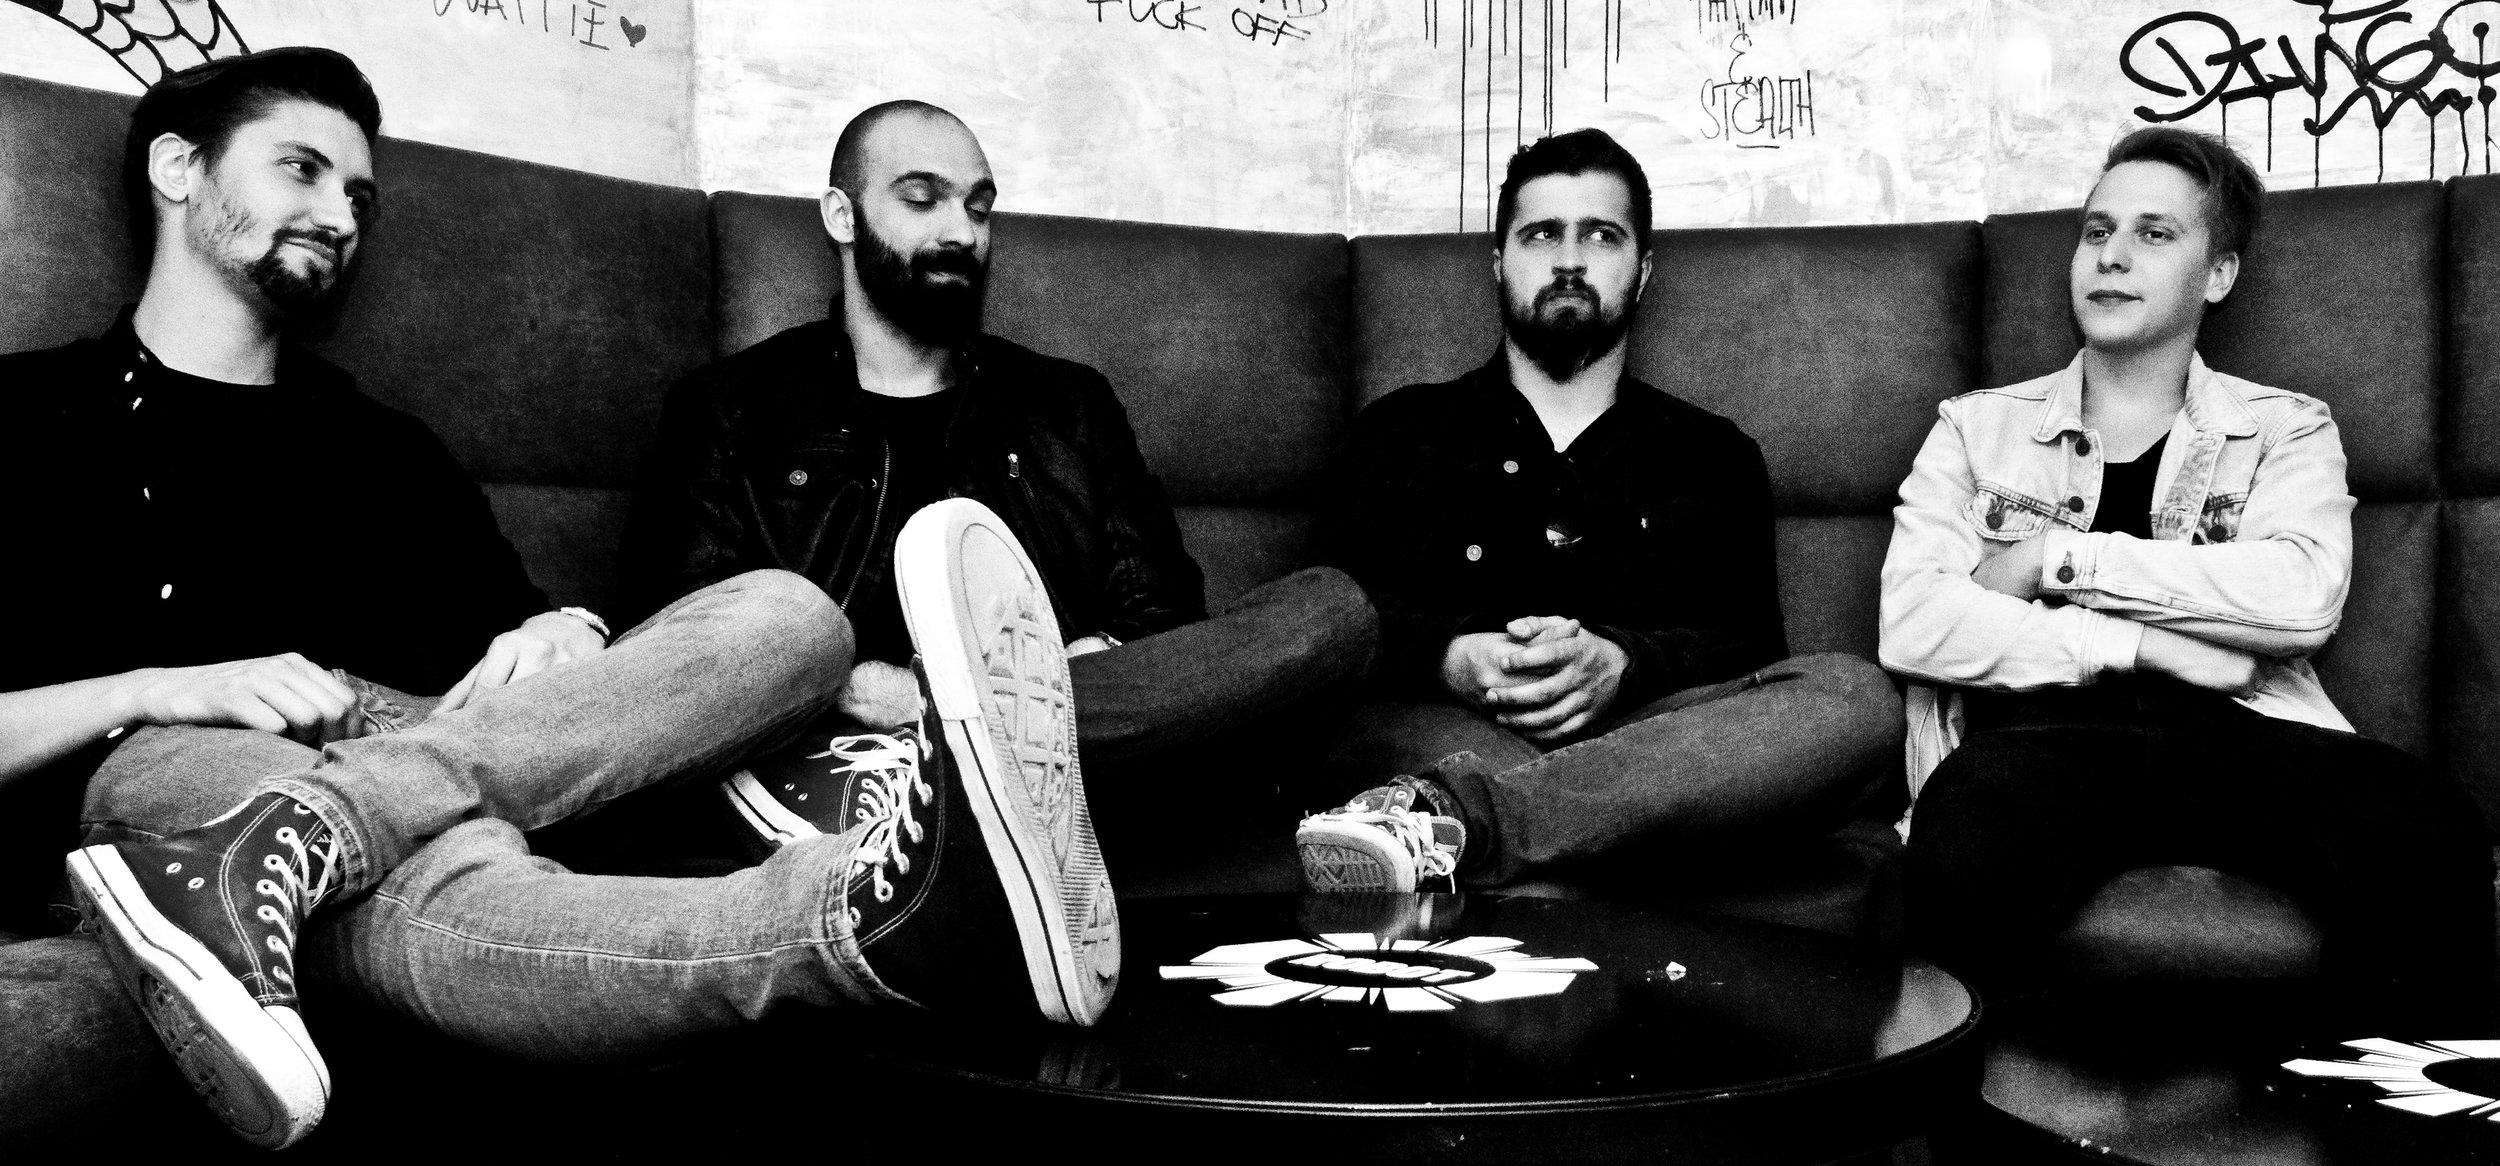 dungaree-band-zenekar-press.jpg